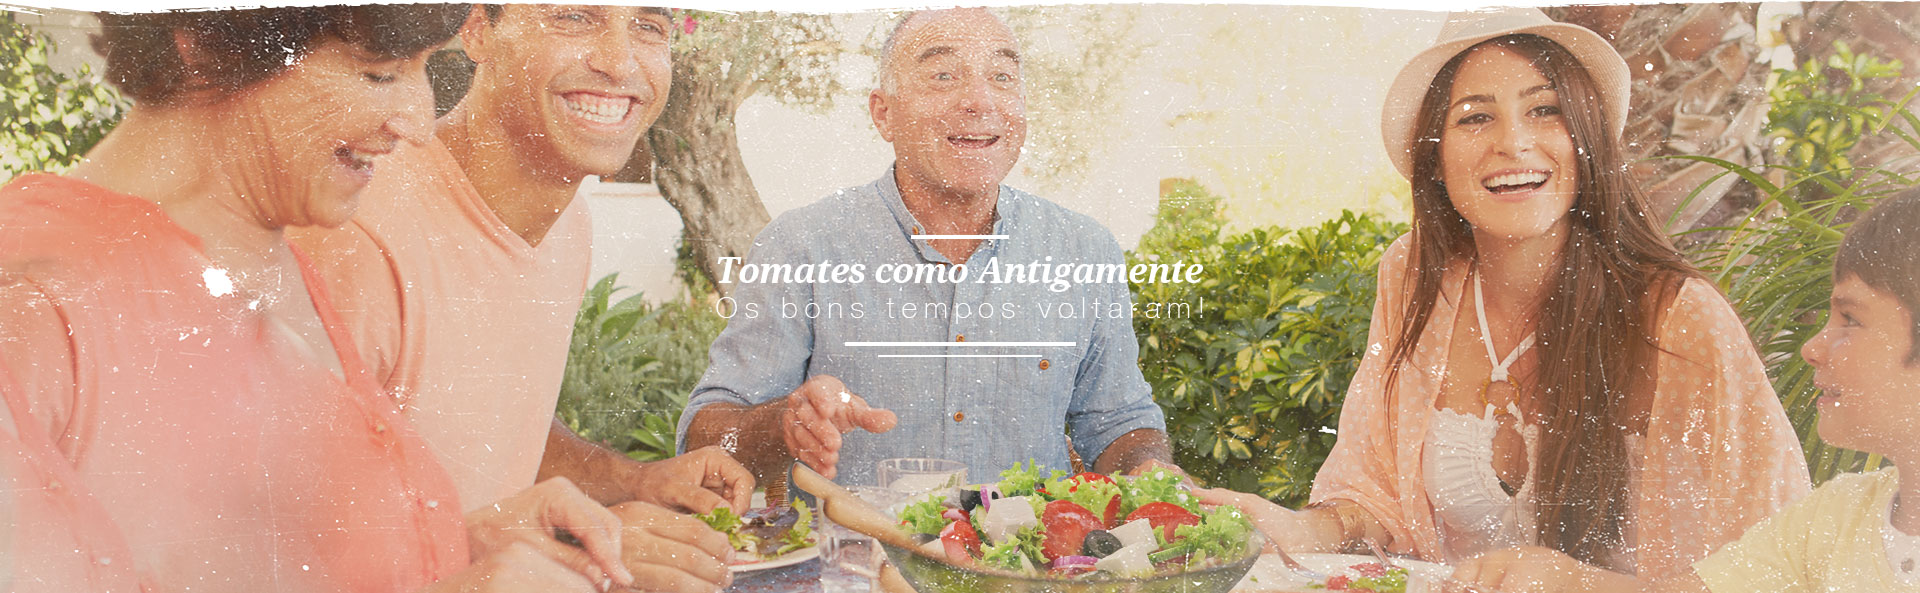 banner-tomate-como-antigamente